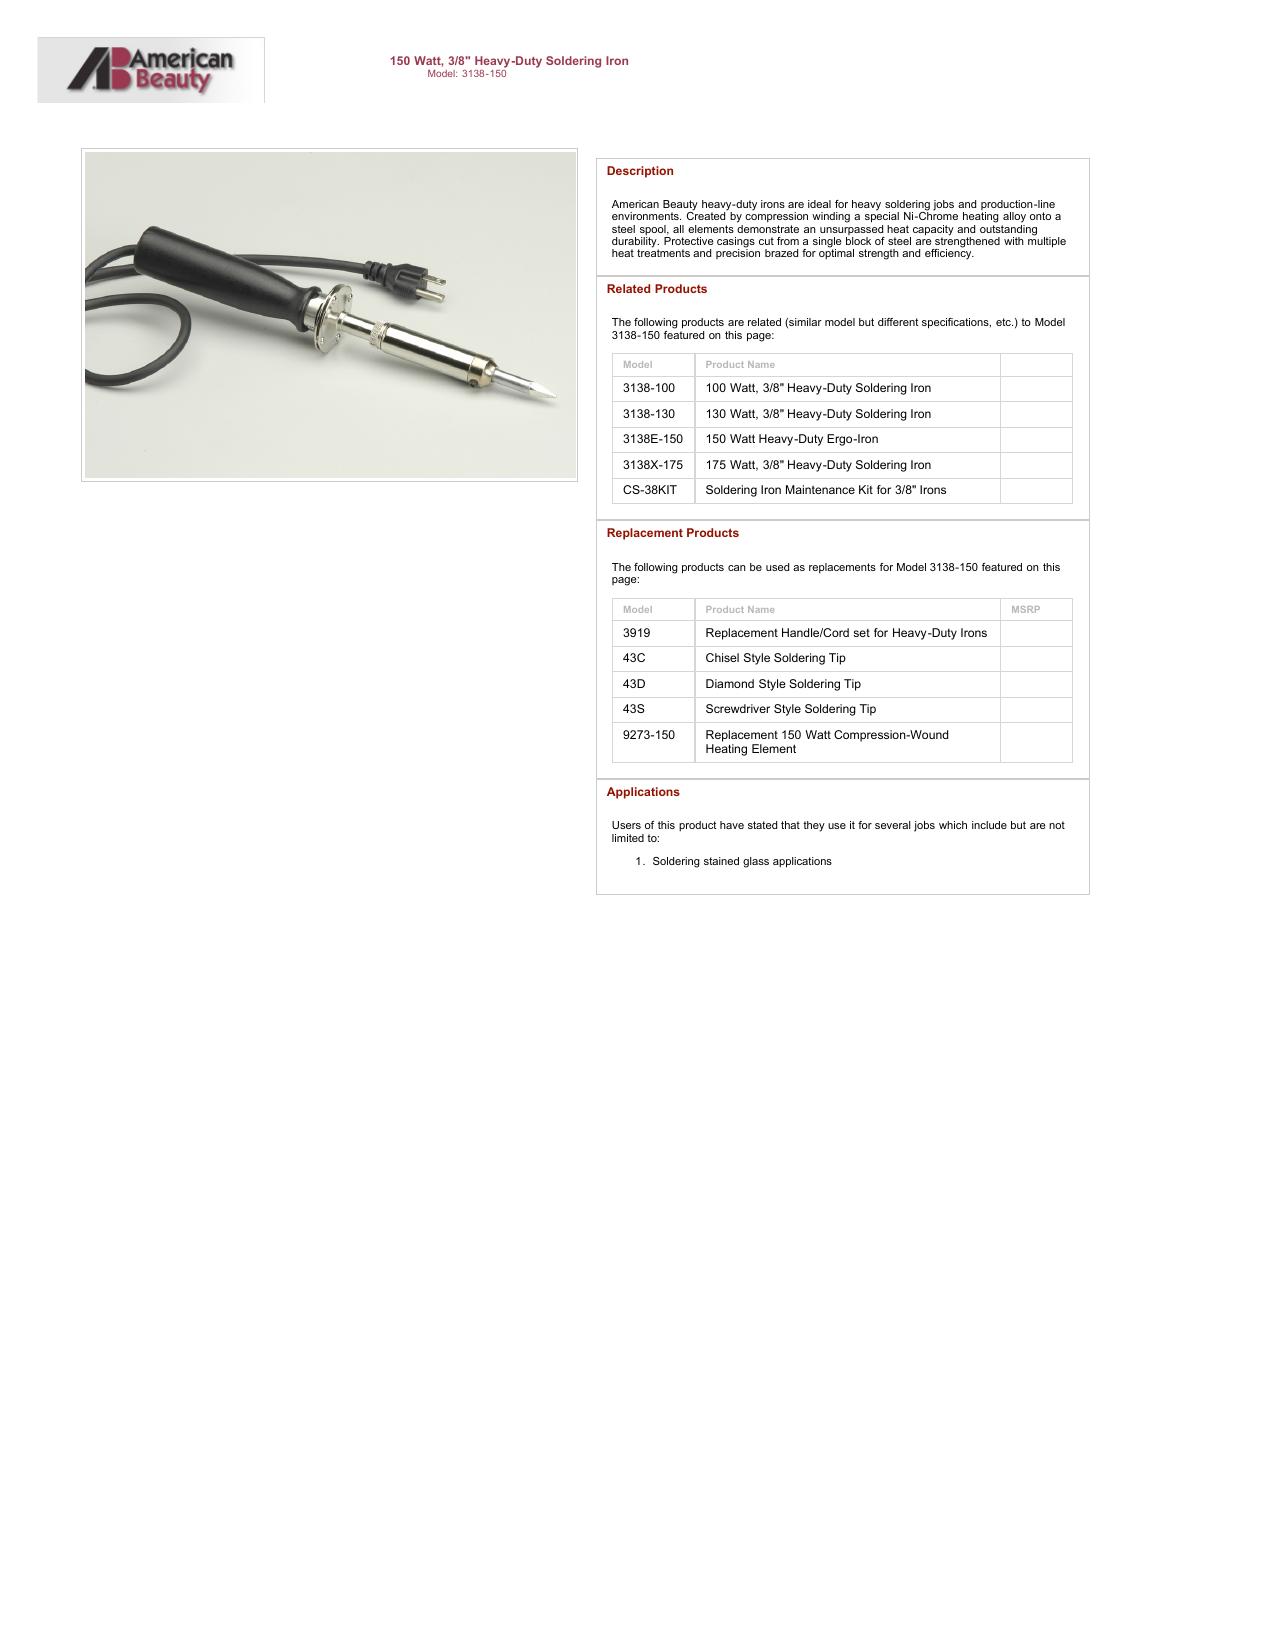 100 Watt 3//8 Diamond Tip American Beauty 3138E-100 Heavy-Duty Ergo-Iron